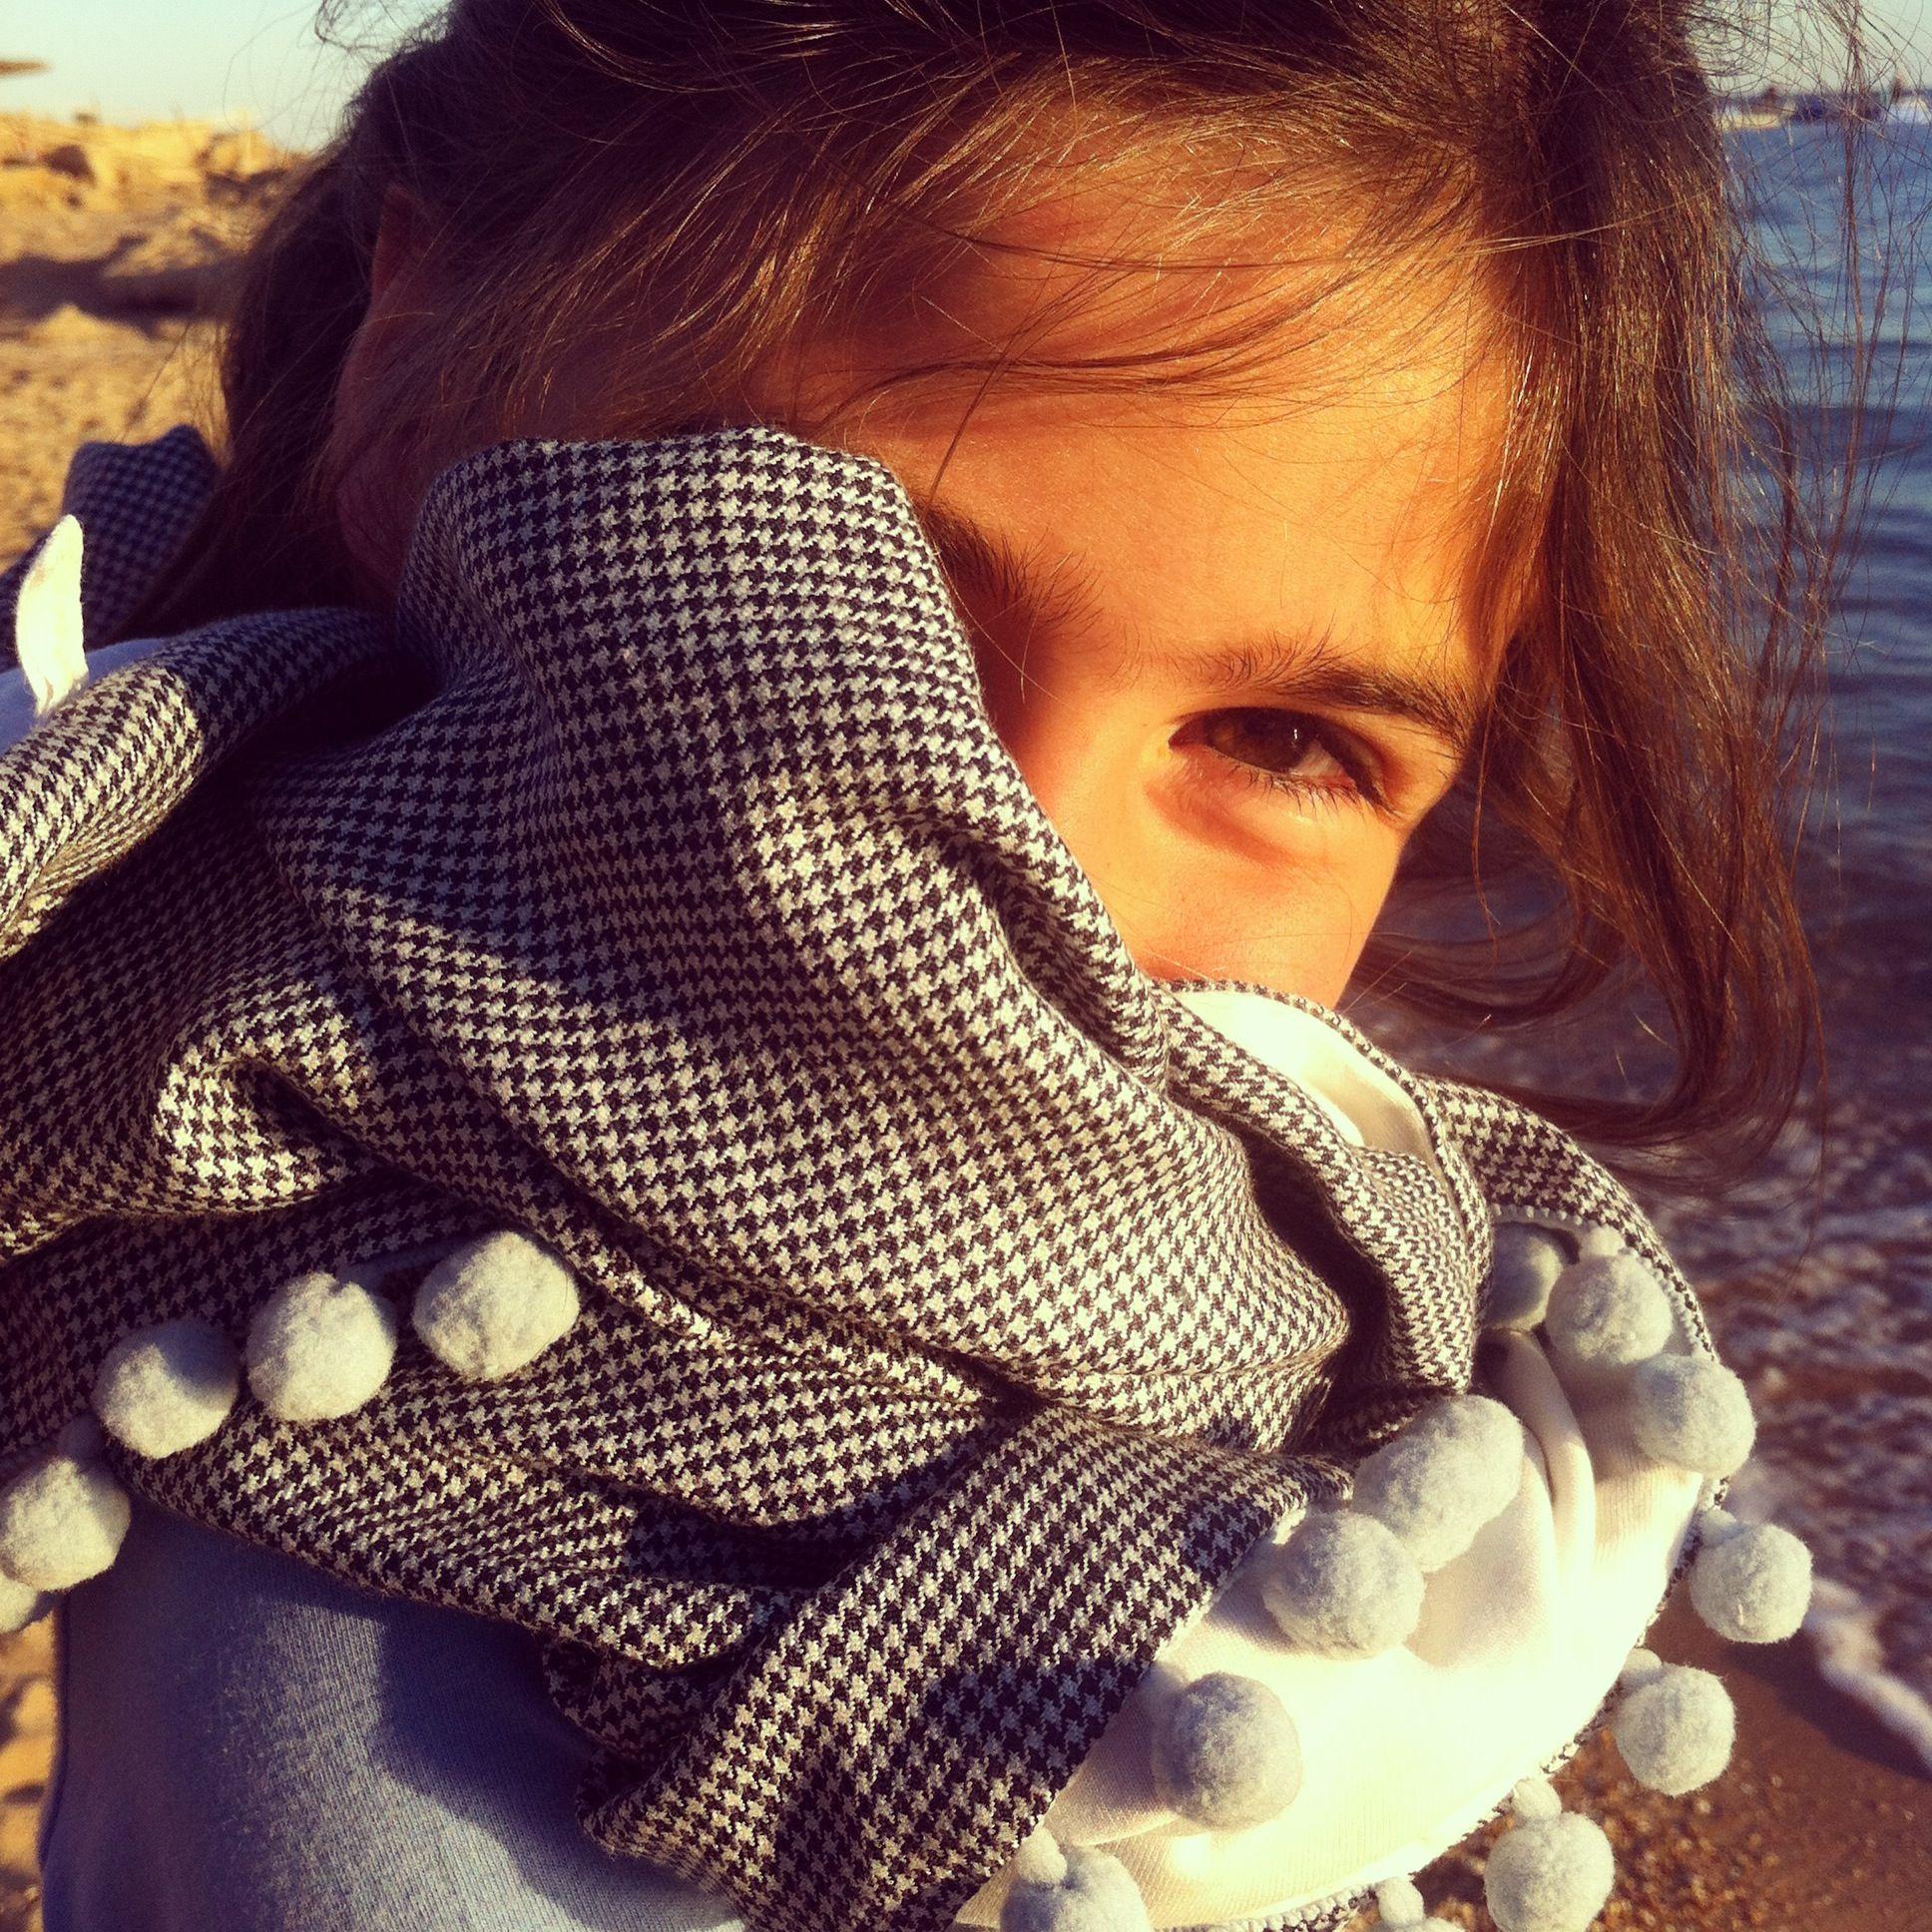 Enjoy ❤ Maxi Foulard / Copertina Le Pezze  www.lepezze.com Double-face foulard! #shoponline #foulard #LePezze www.lepezze.com